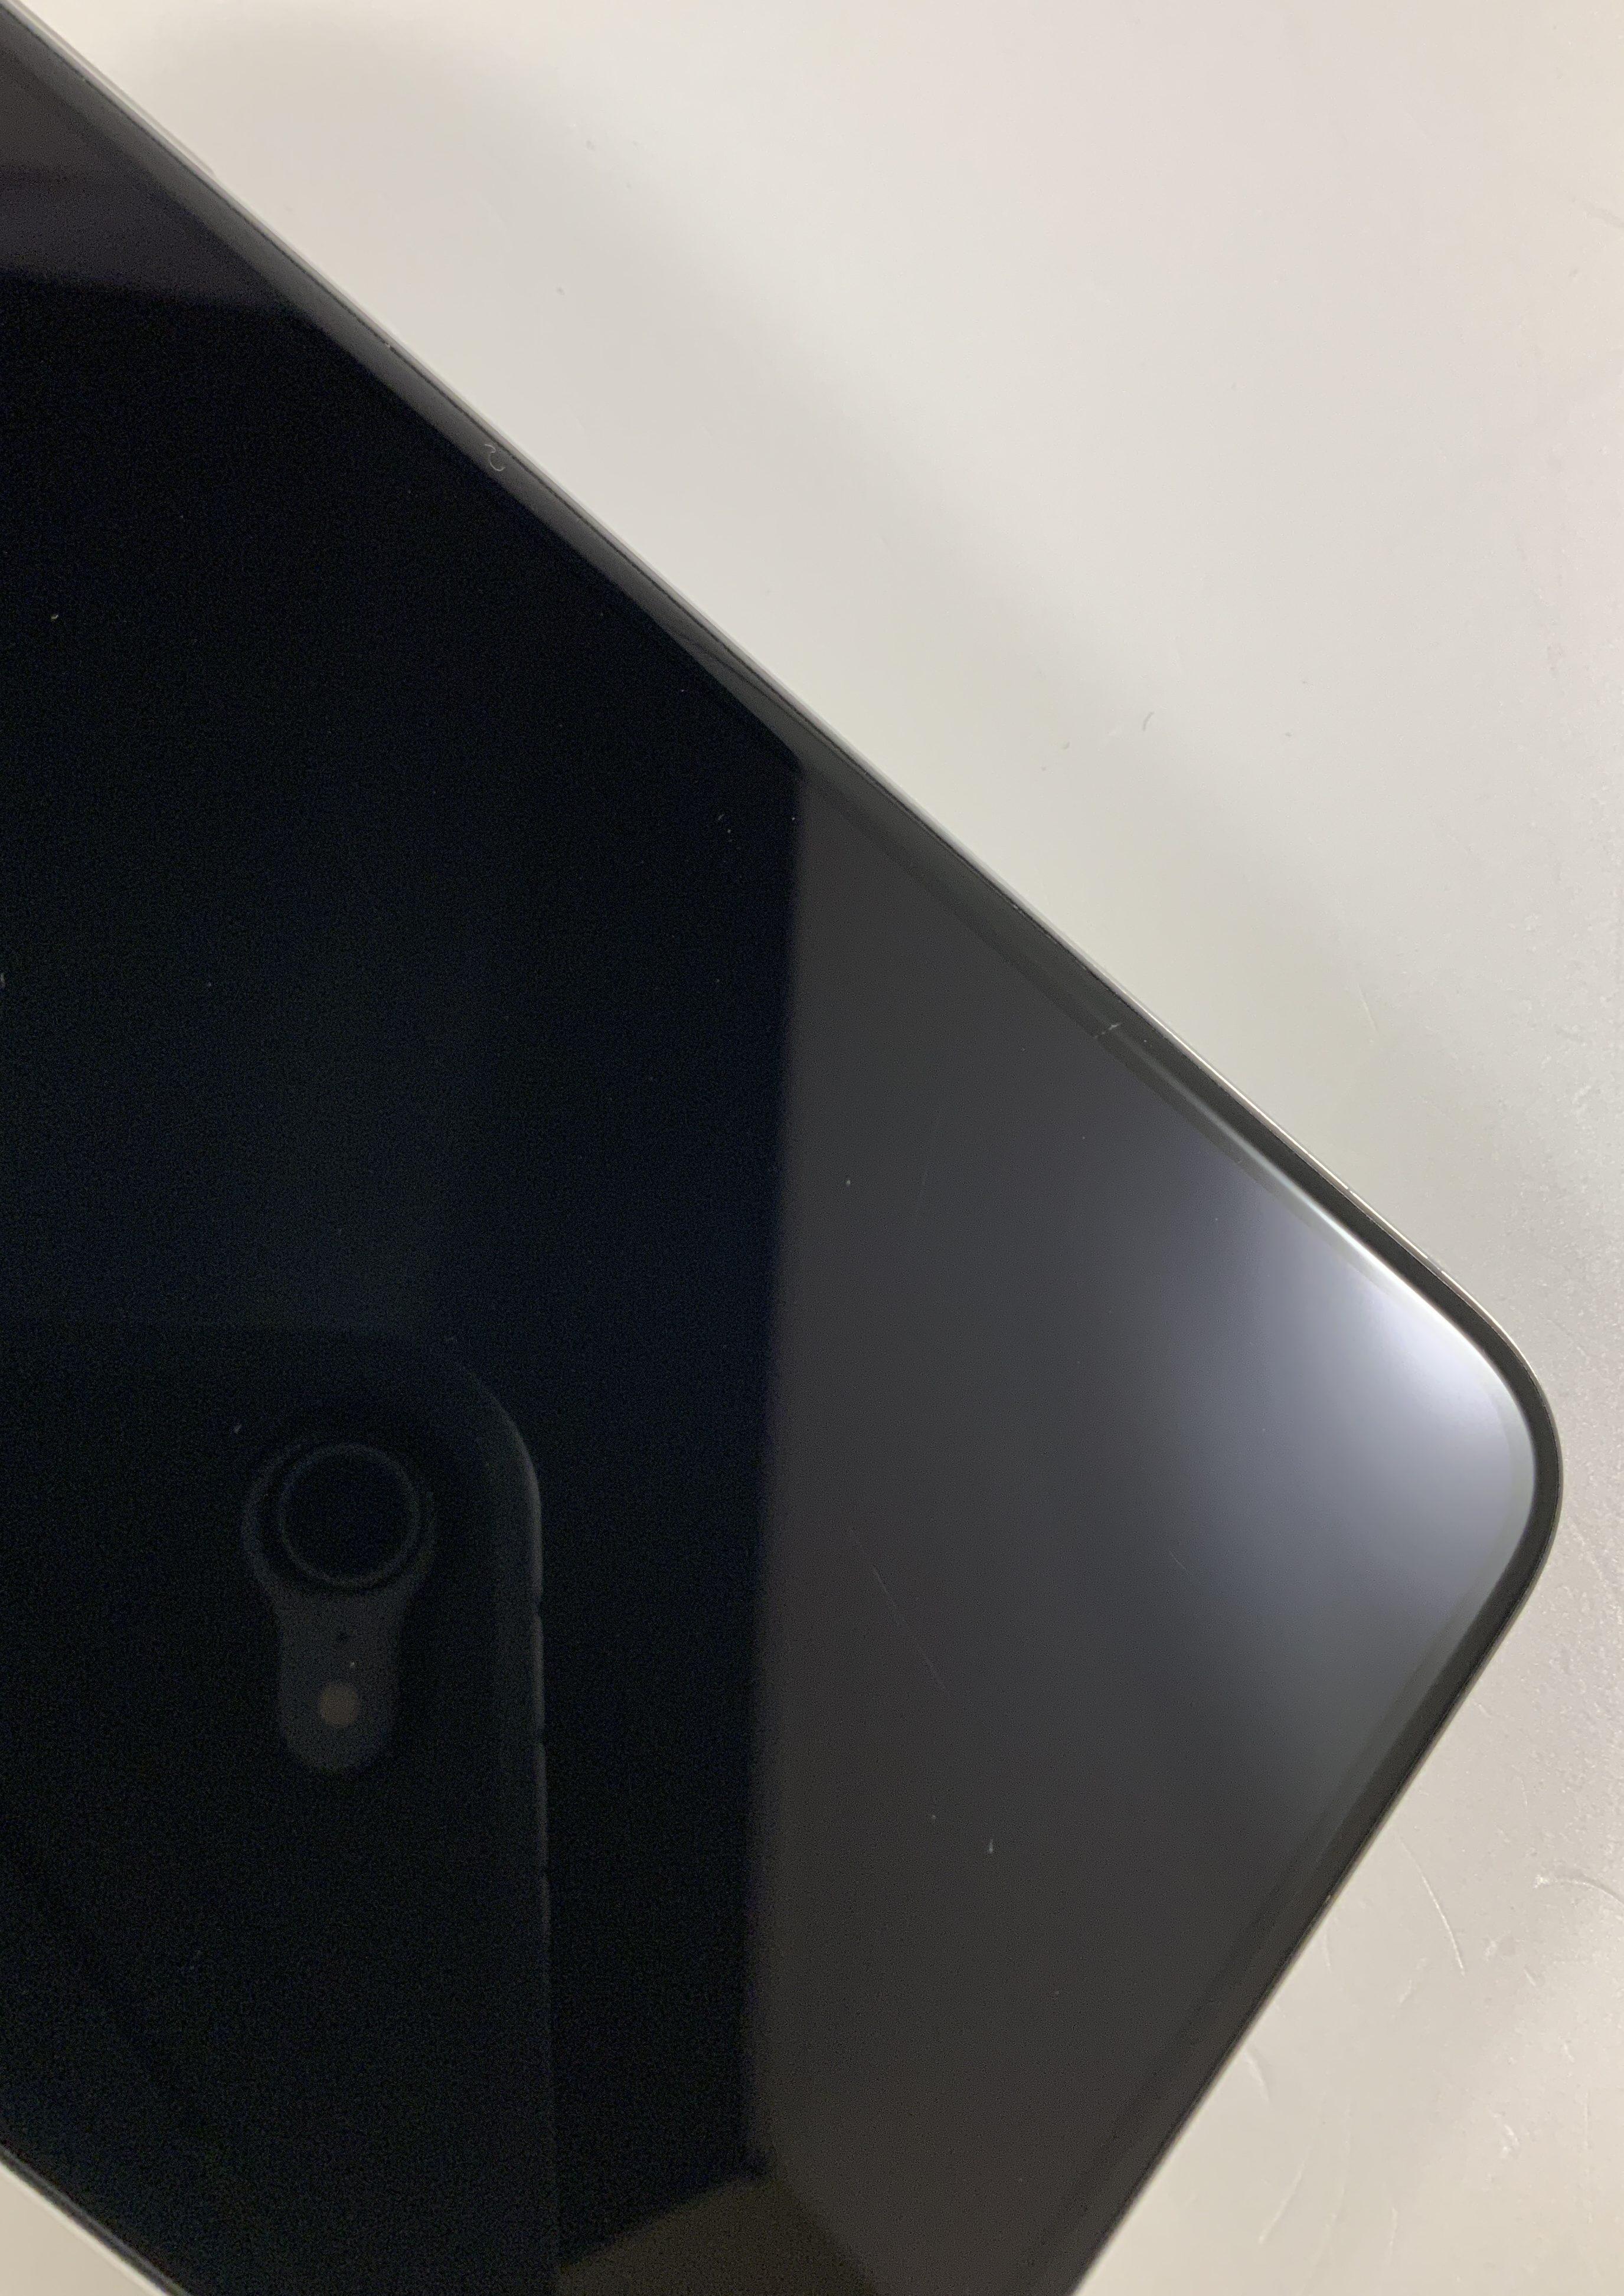 iPhone XS 64GB, 64GB, Silver, immagine 4